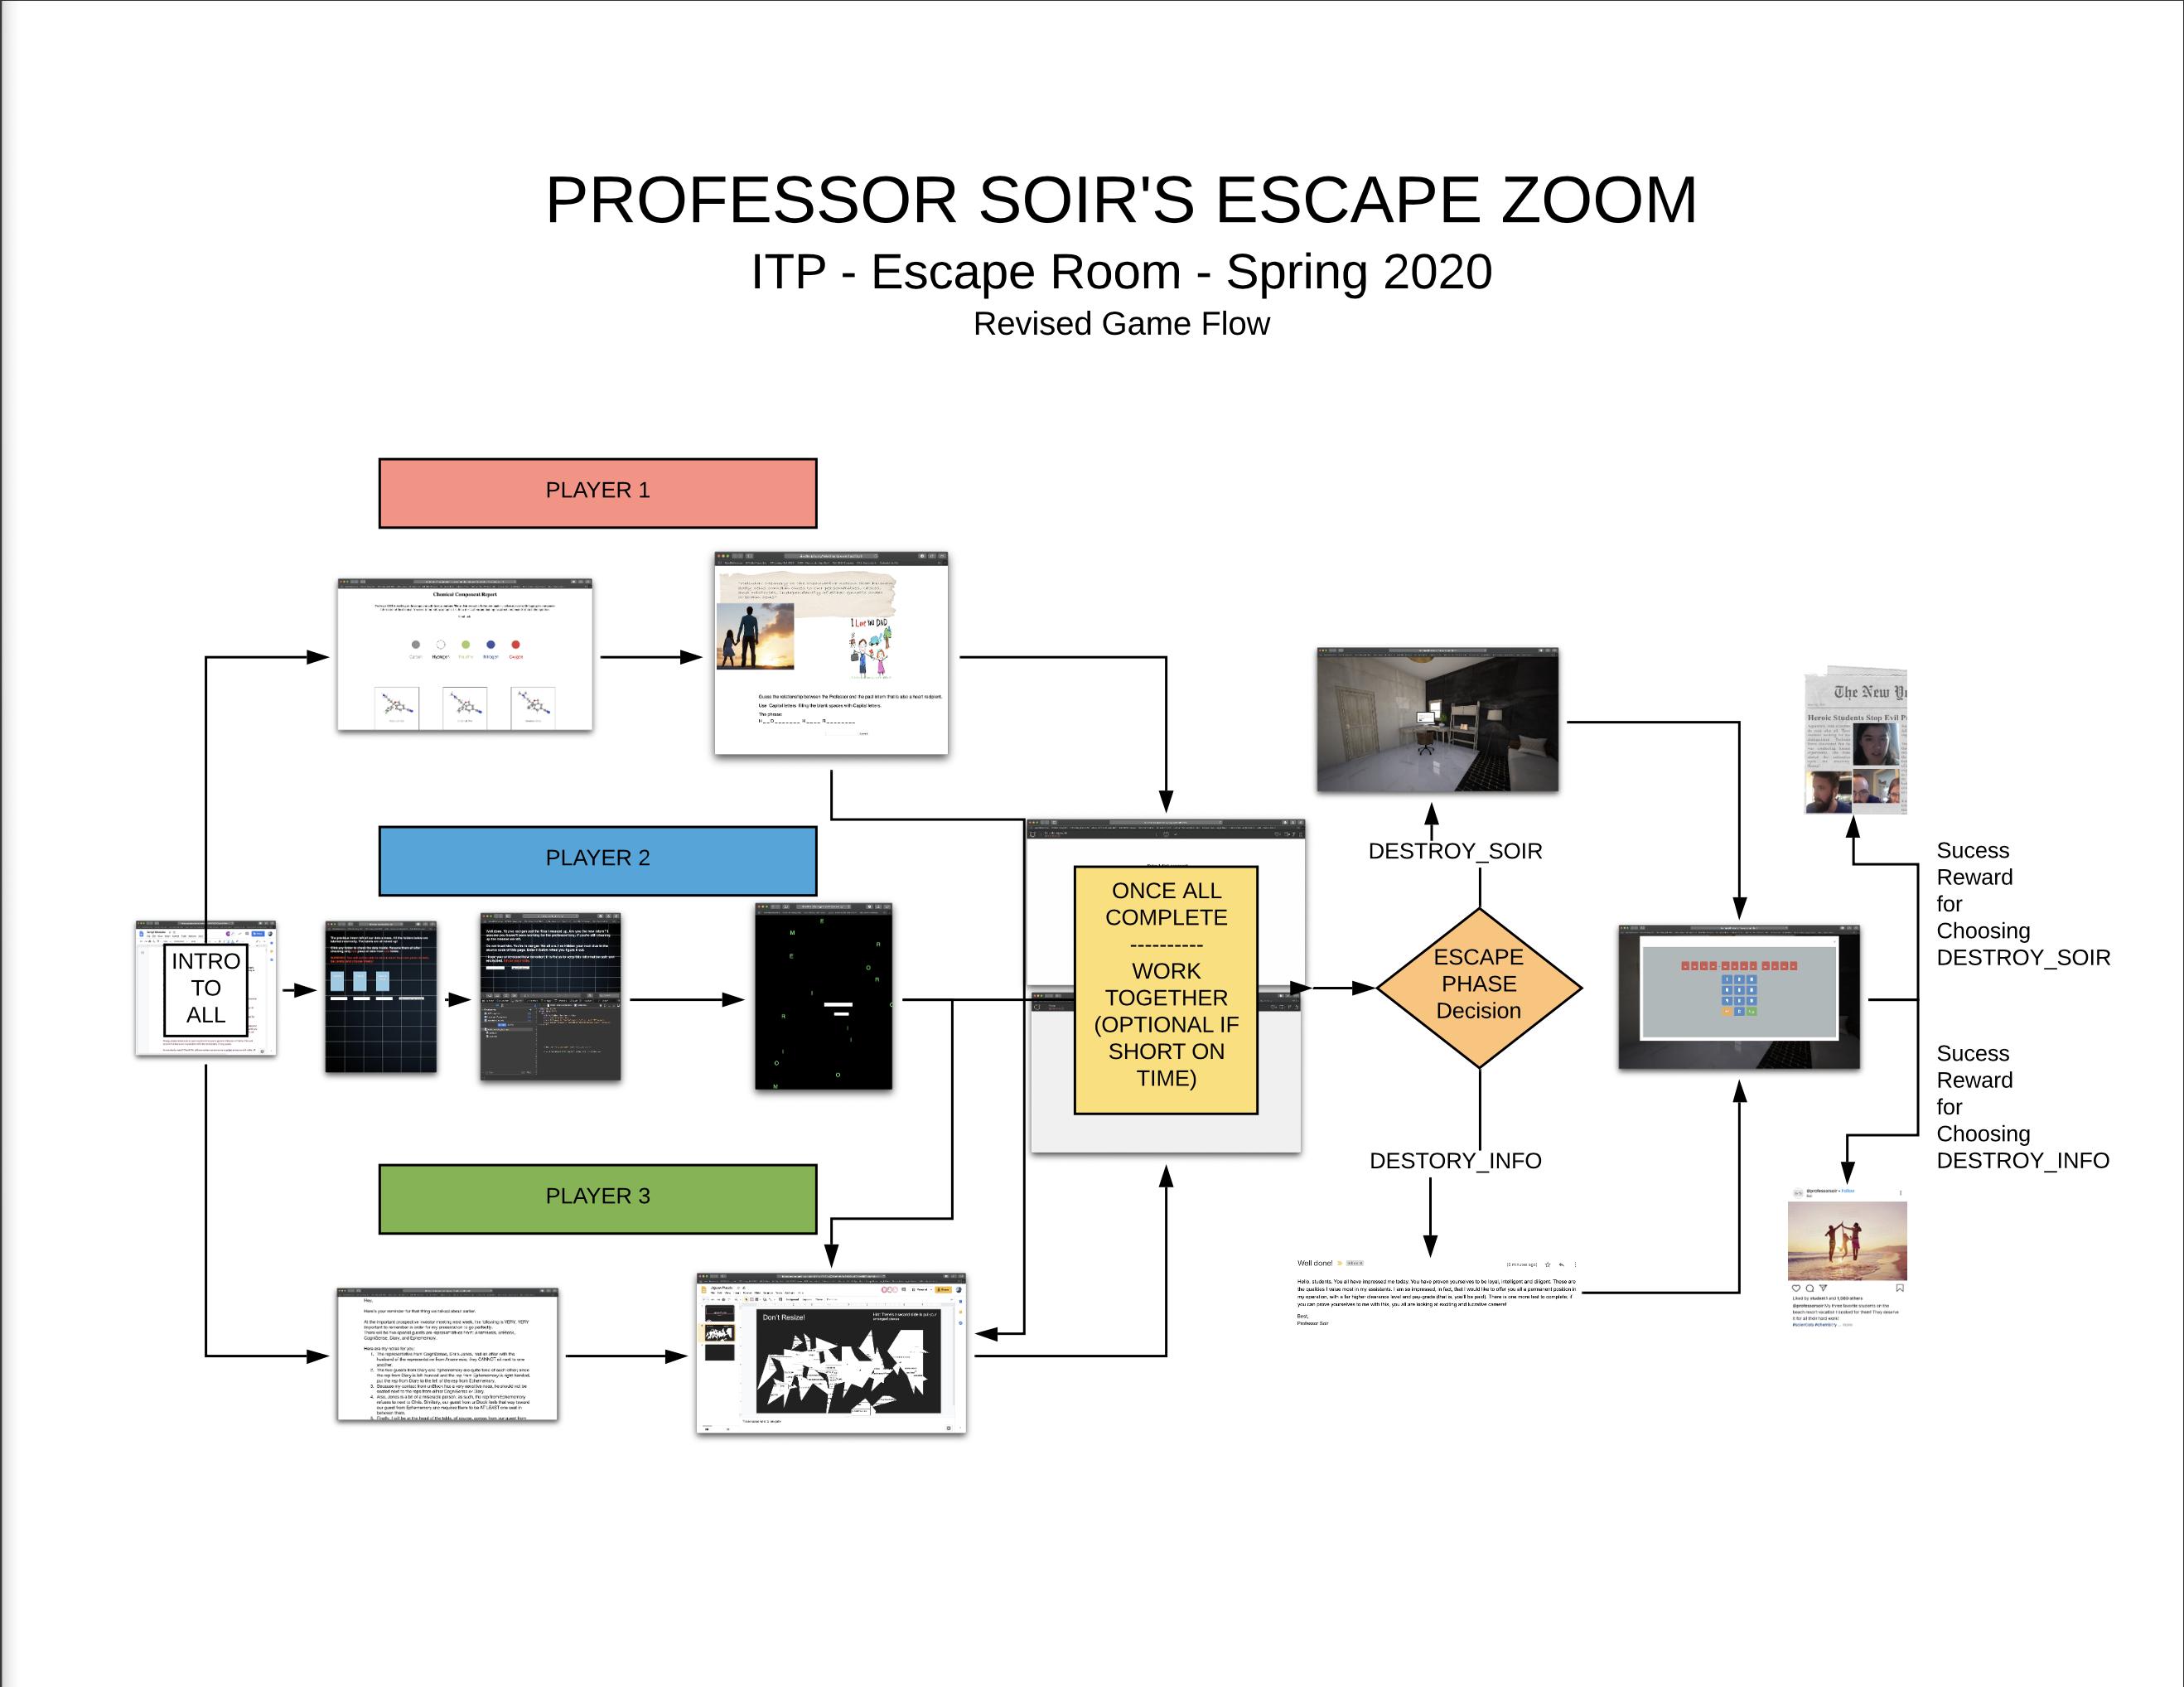 Professor Soir's Escape Zoom REVISED Game Flow